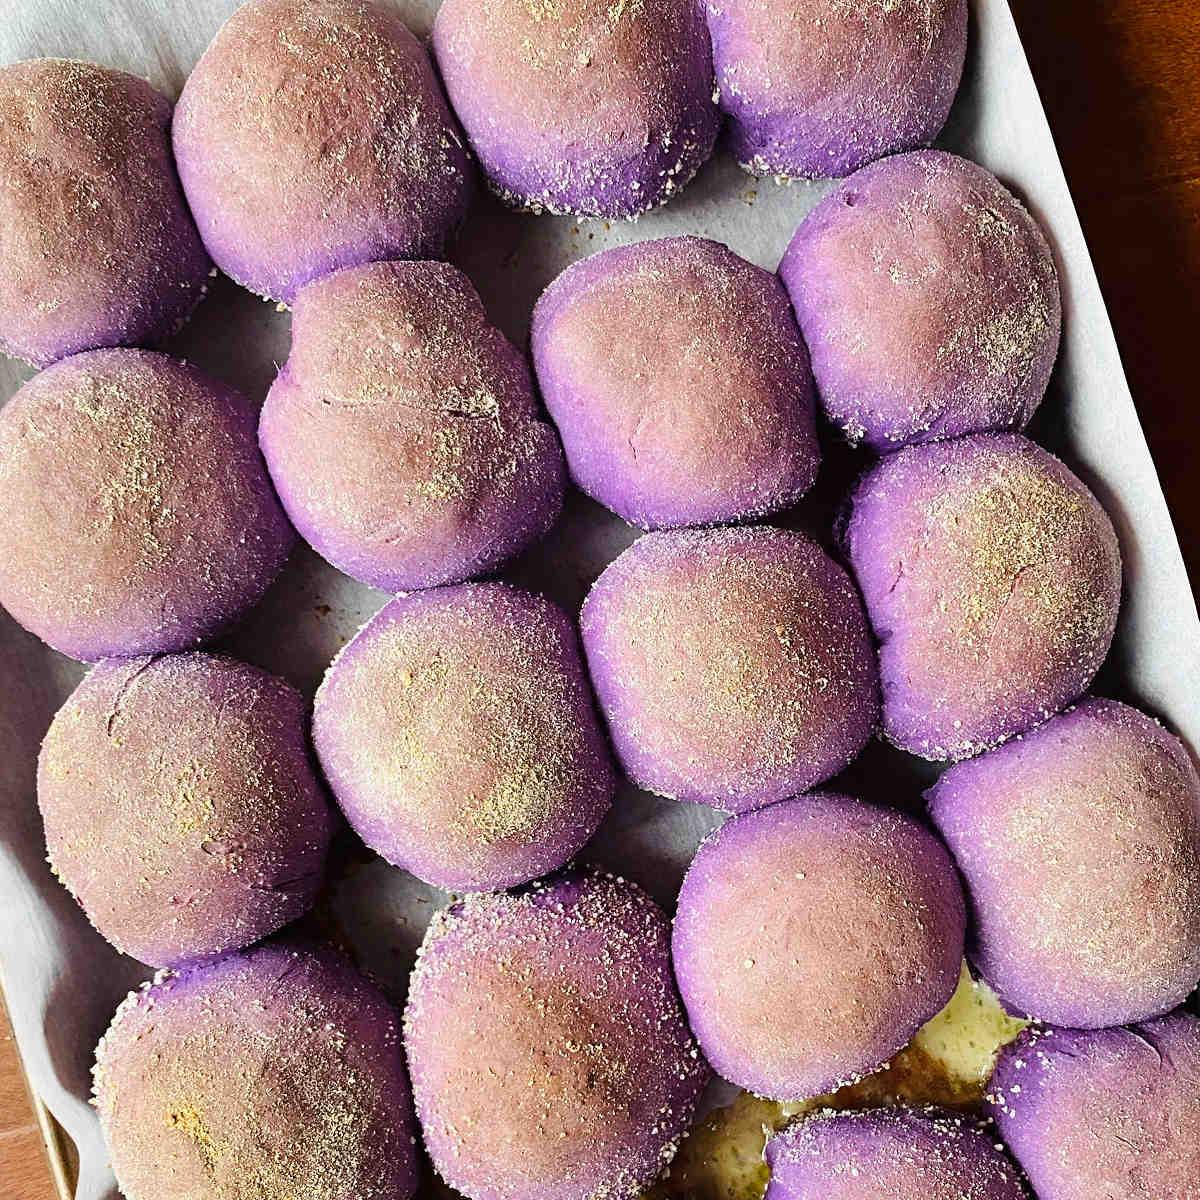 freshly baked ube pandesal rolls on baking sheet